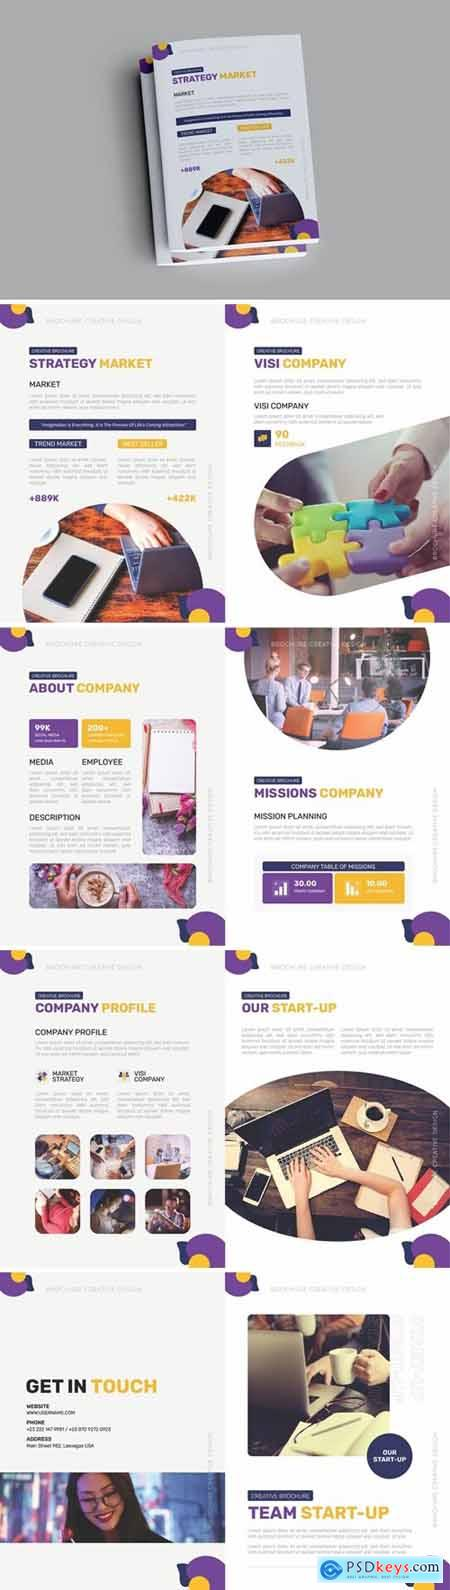 Team Start-Up Brochure